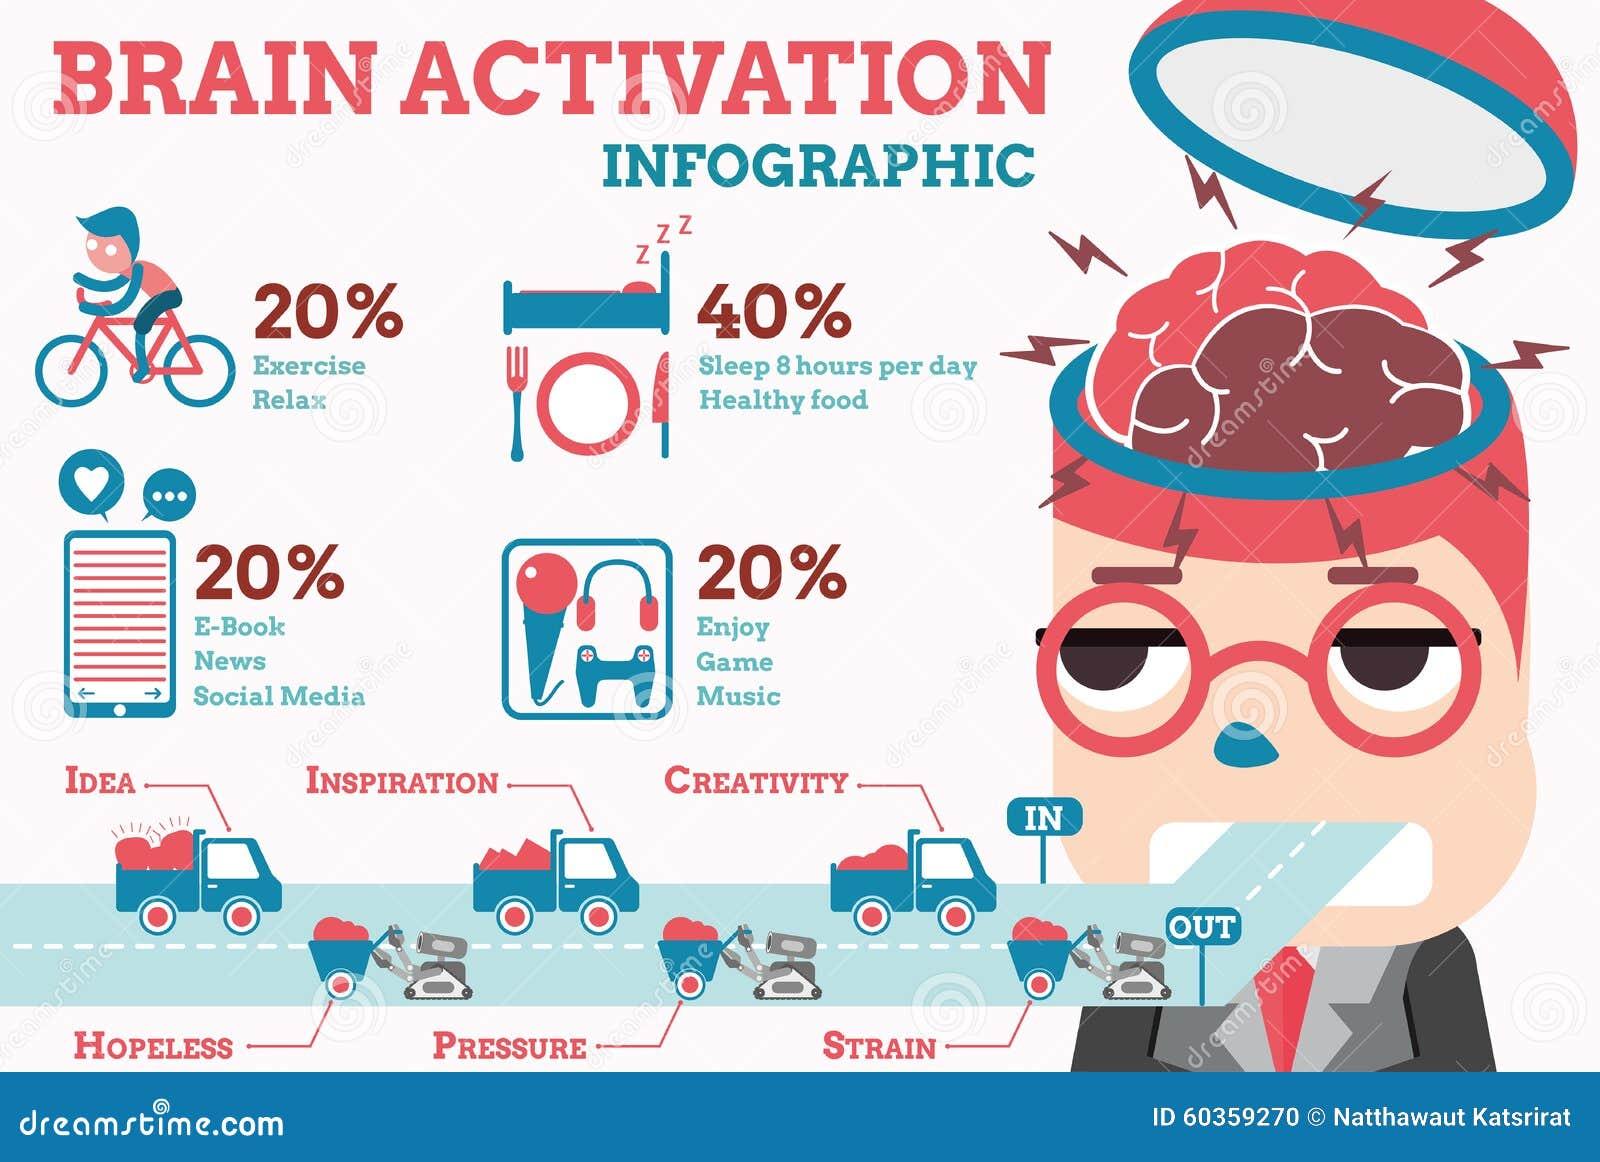 Tips to increase brain memory power image 2